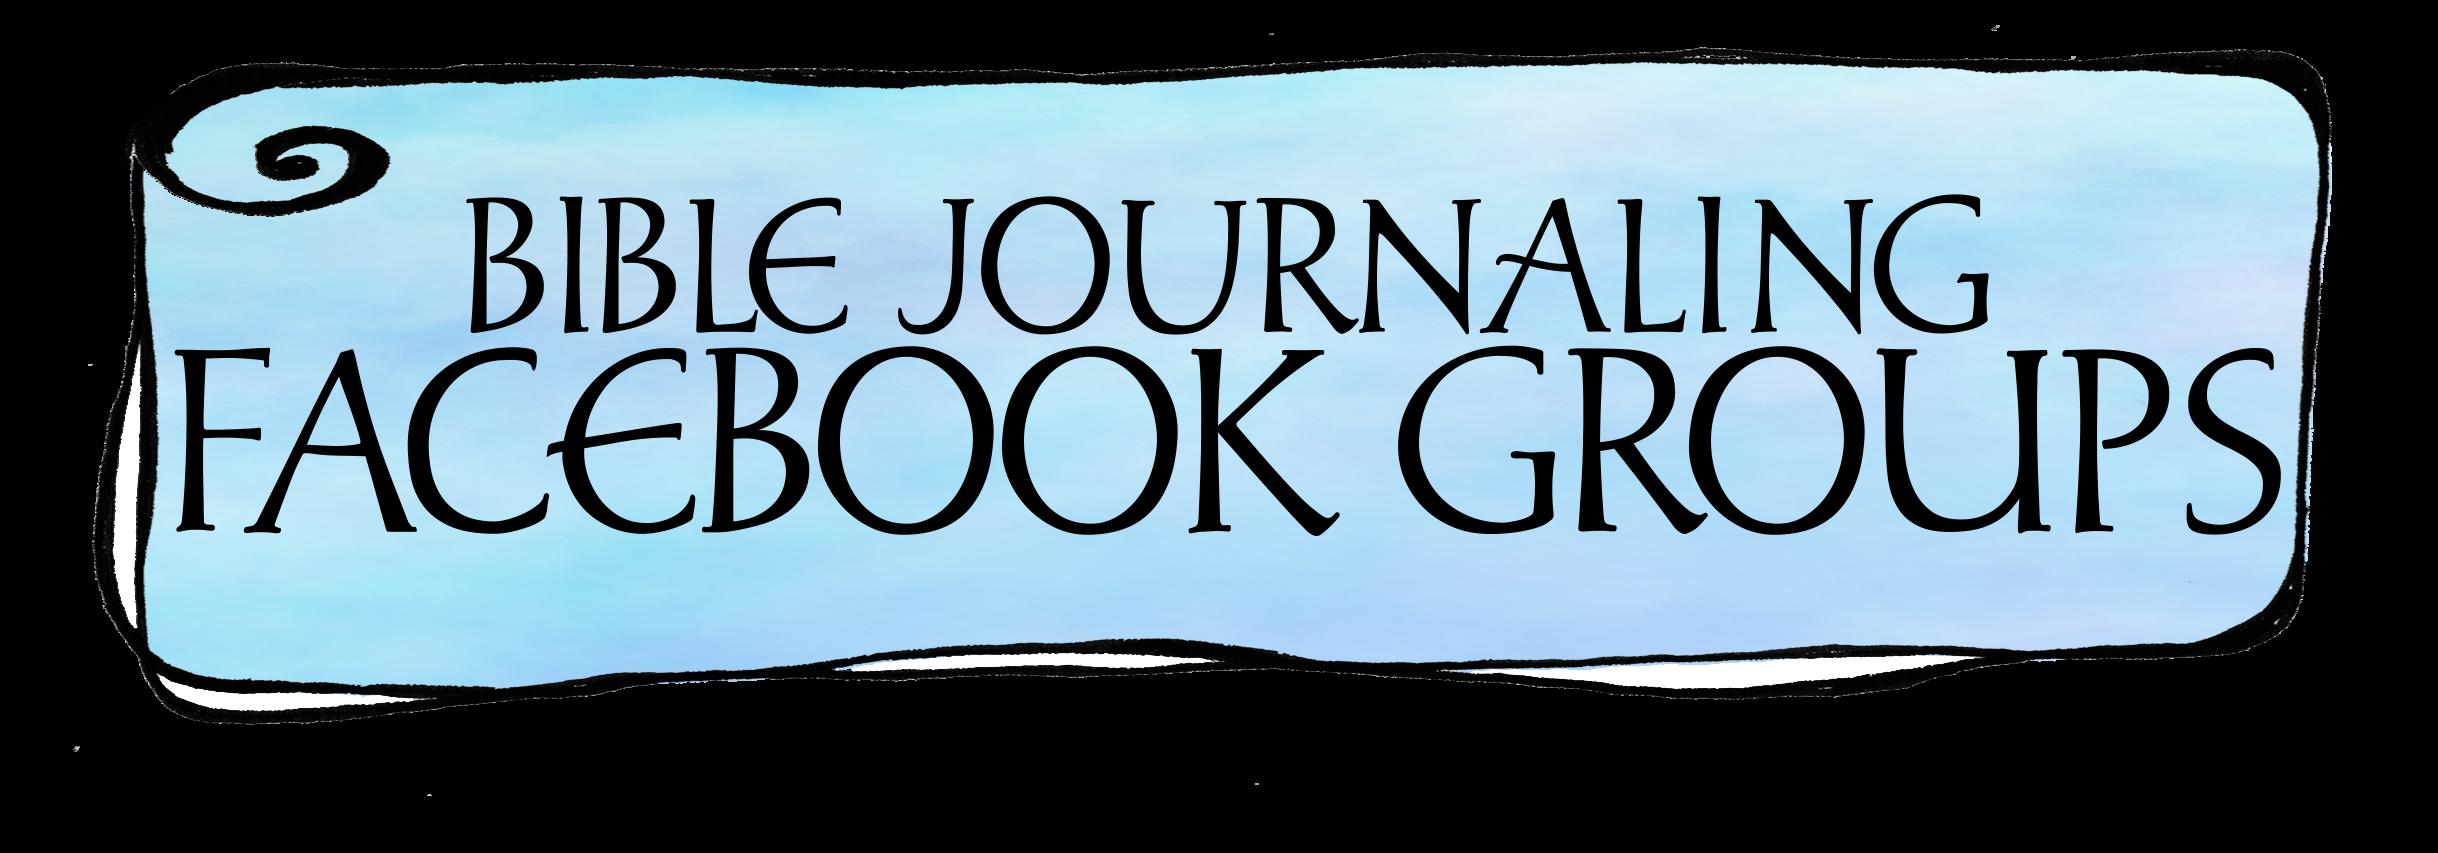 Bible Journaling Facebook